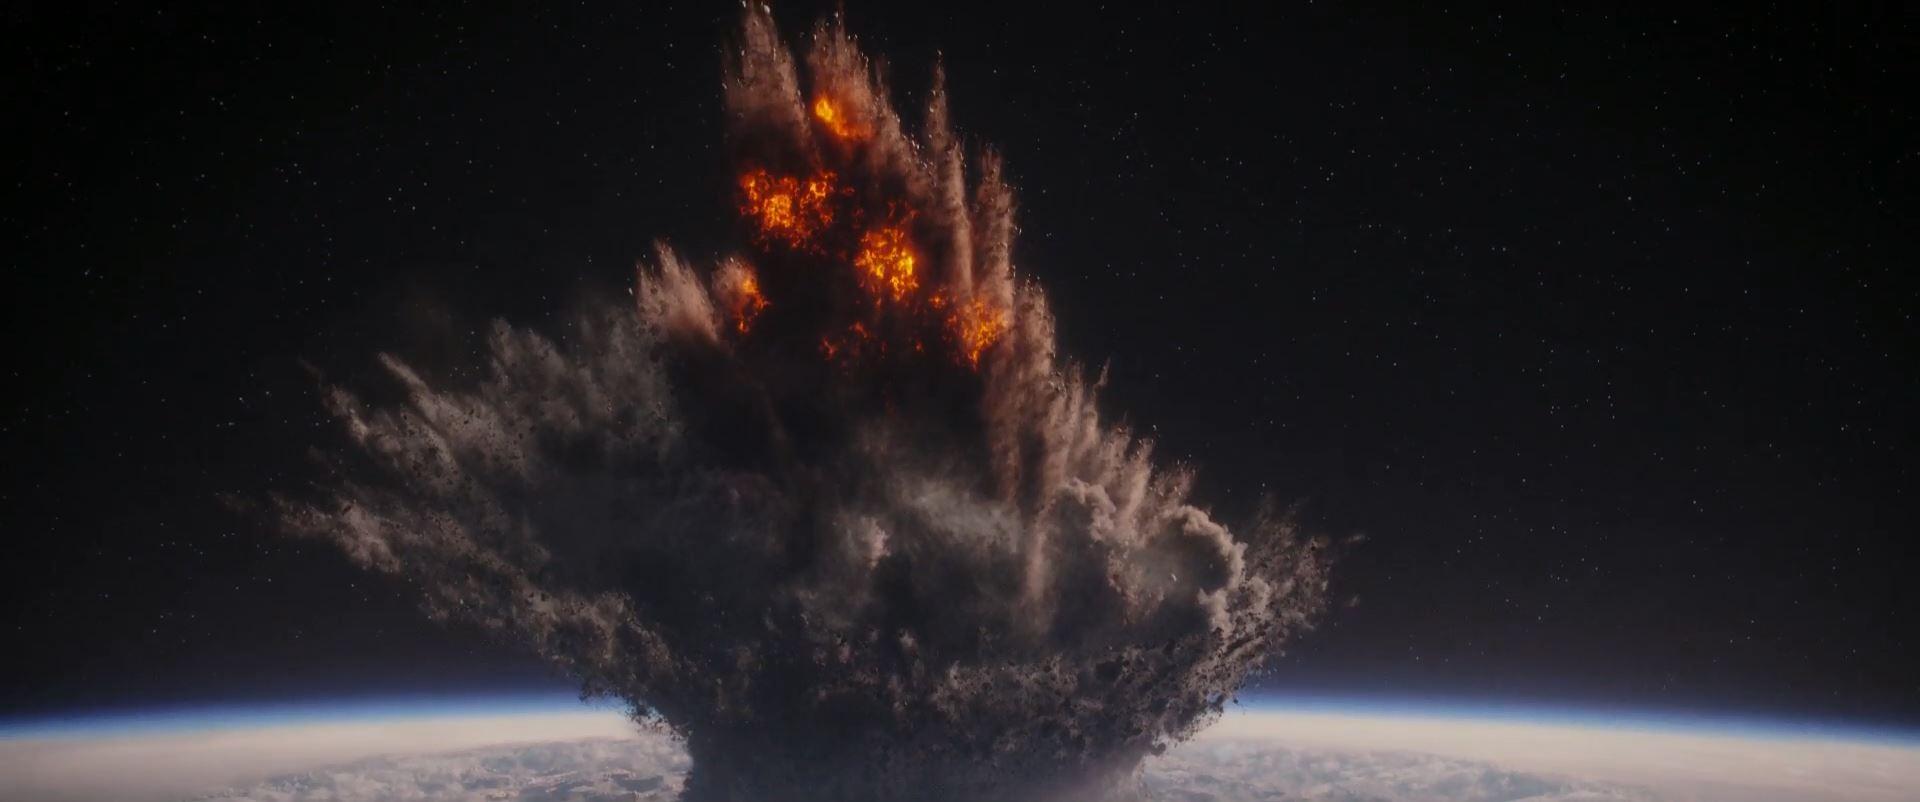 Rogue One - Jeddha explosion